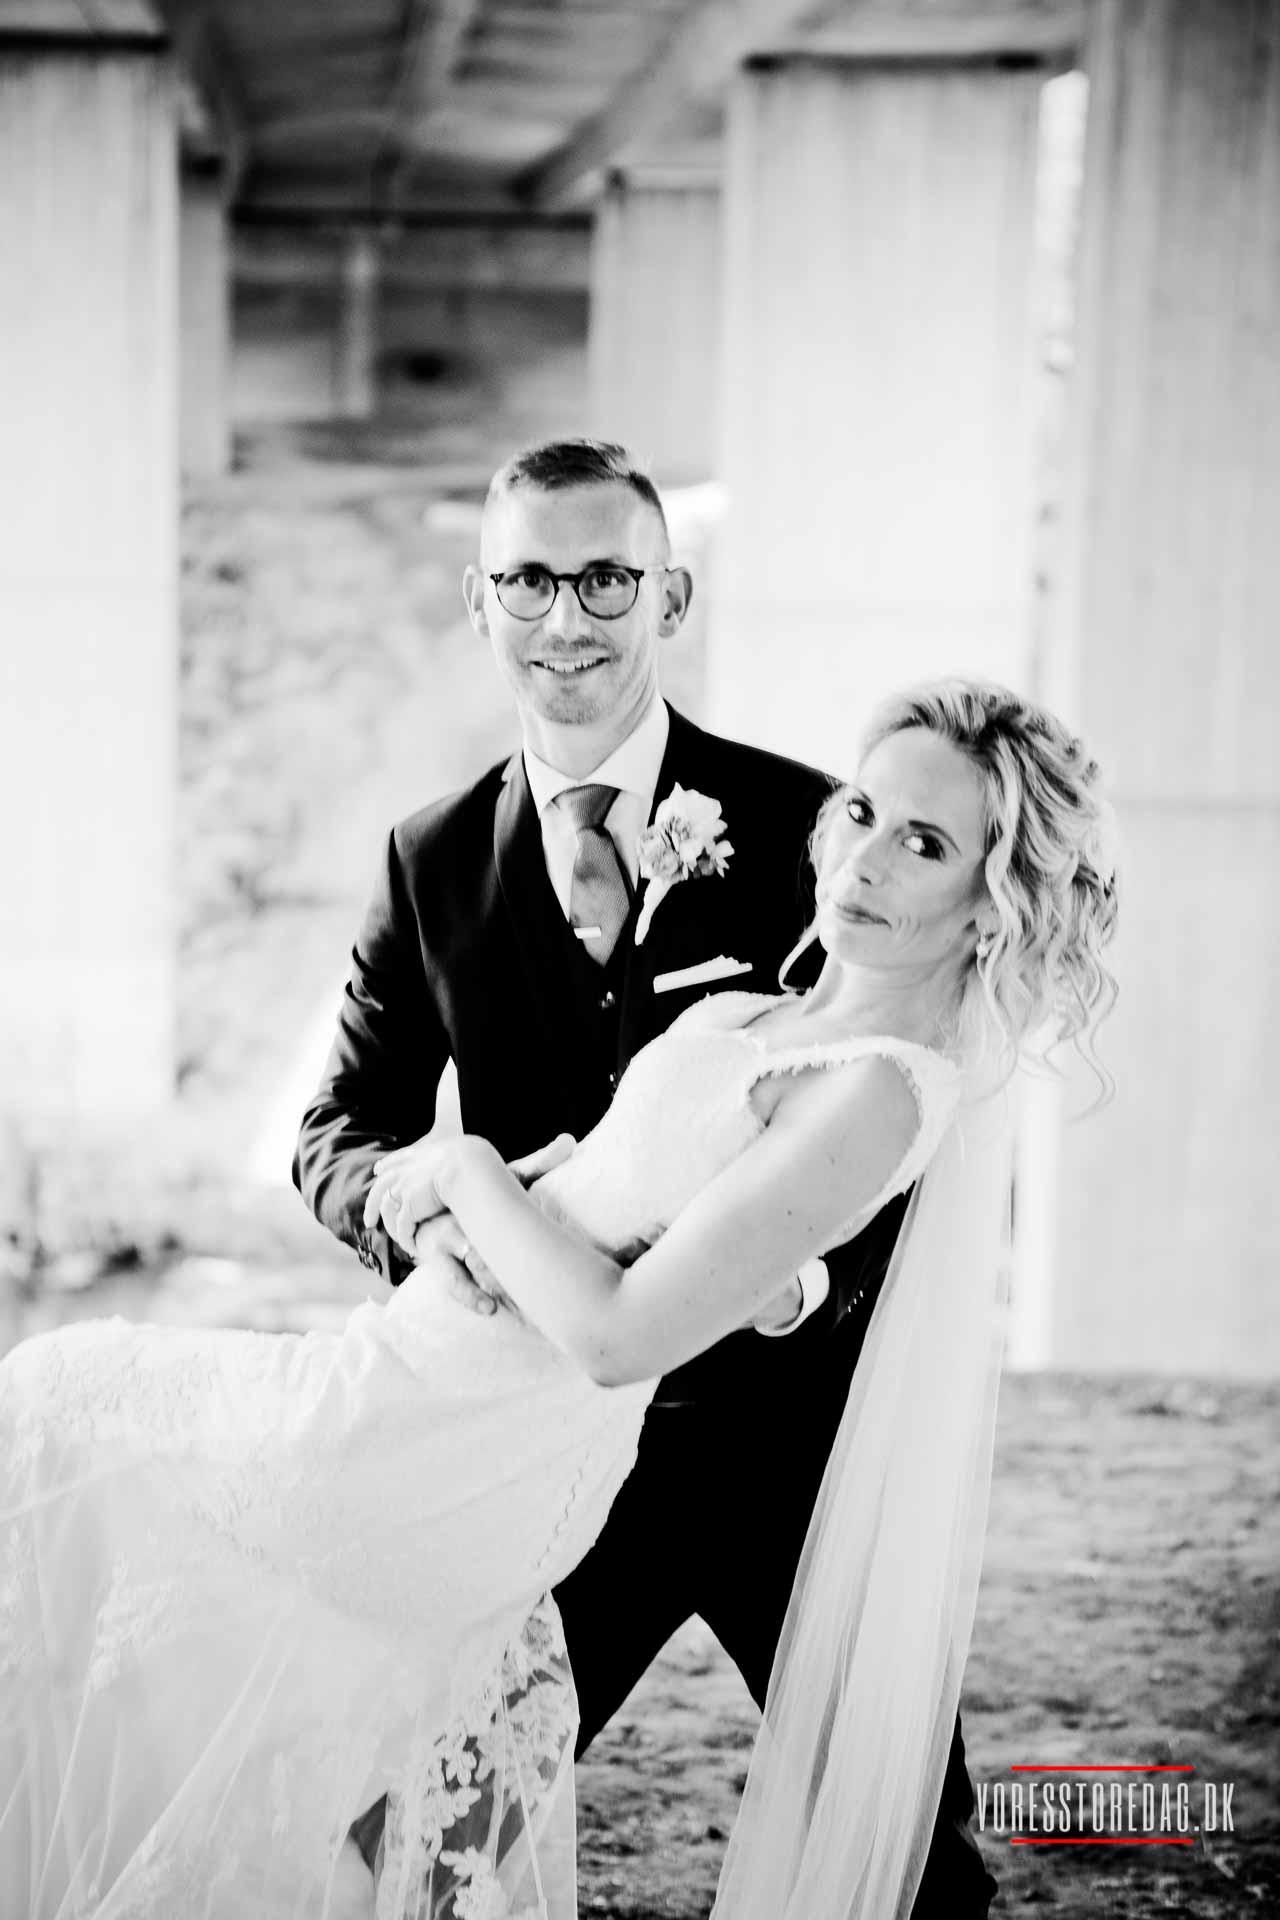 Bryllup i Sønderjylland | Hold bryllupsfest på Tyrstrup Kro